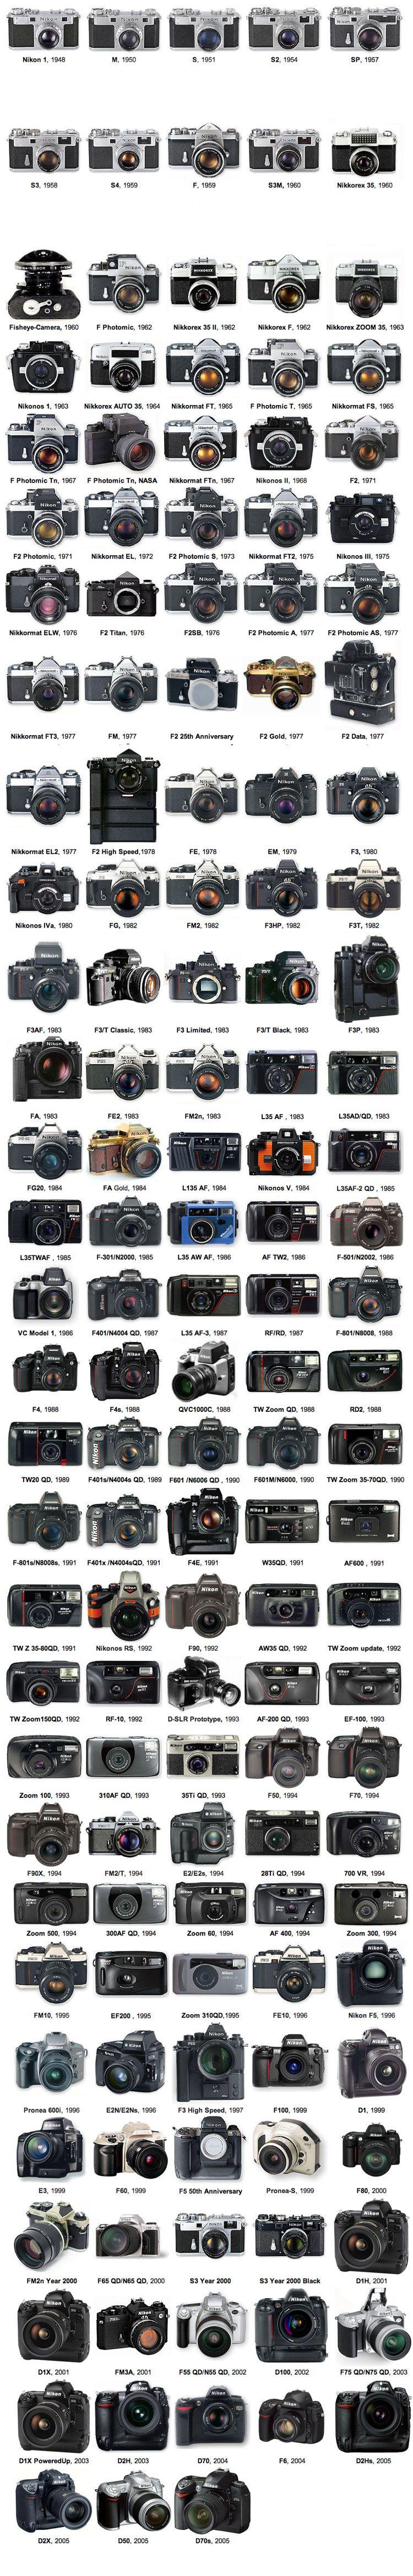 Nikon S History In Pictures From The Nikon 1 Rangefinder To The D70s Dslr Nikon Rumors Nikon Photography Camera Nikon Vintage Cameras